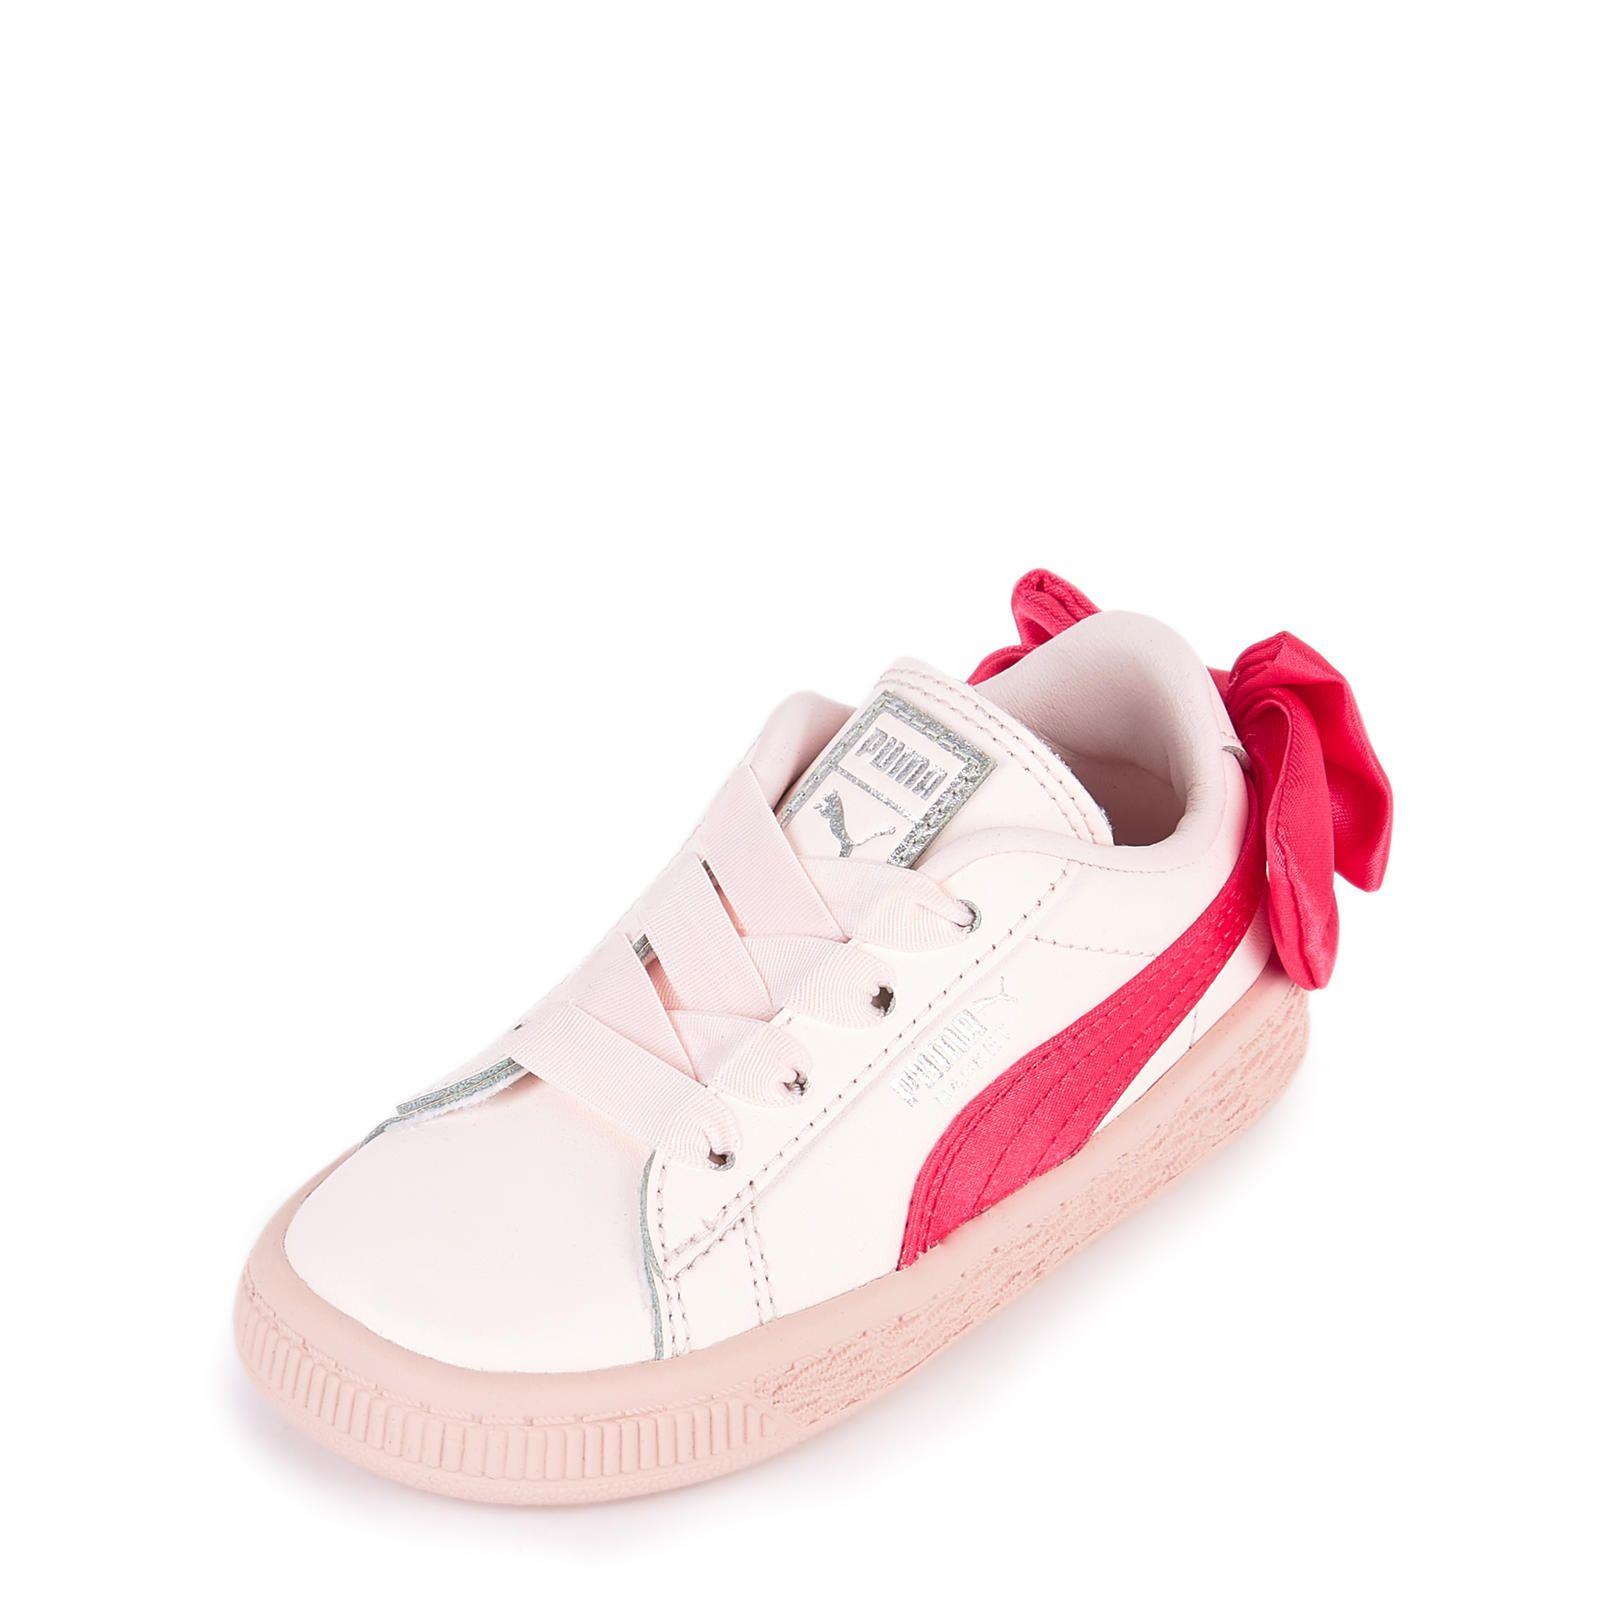 puma shoes for babies